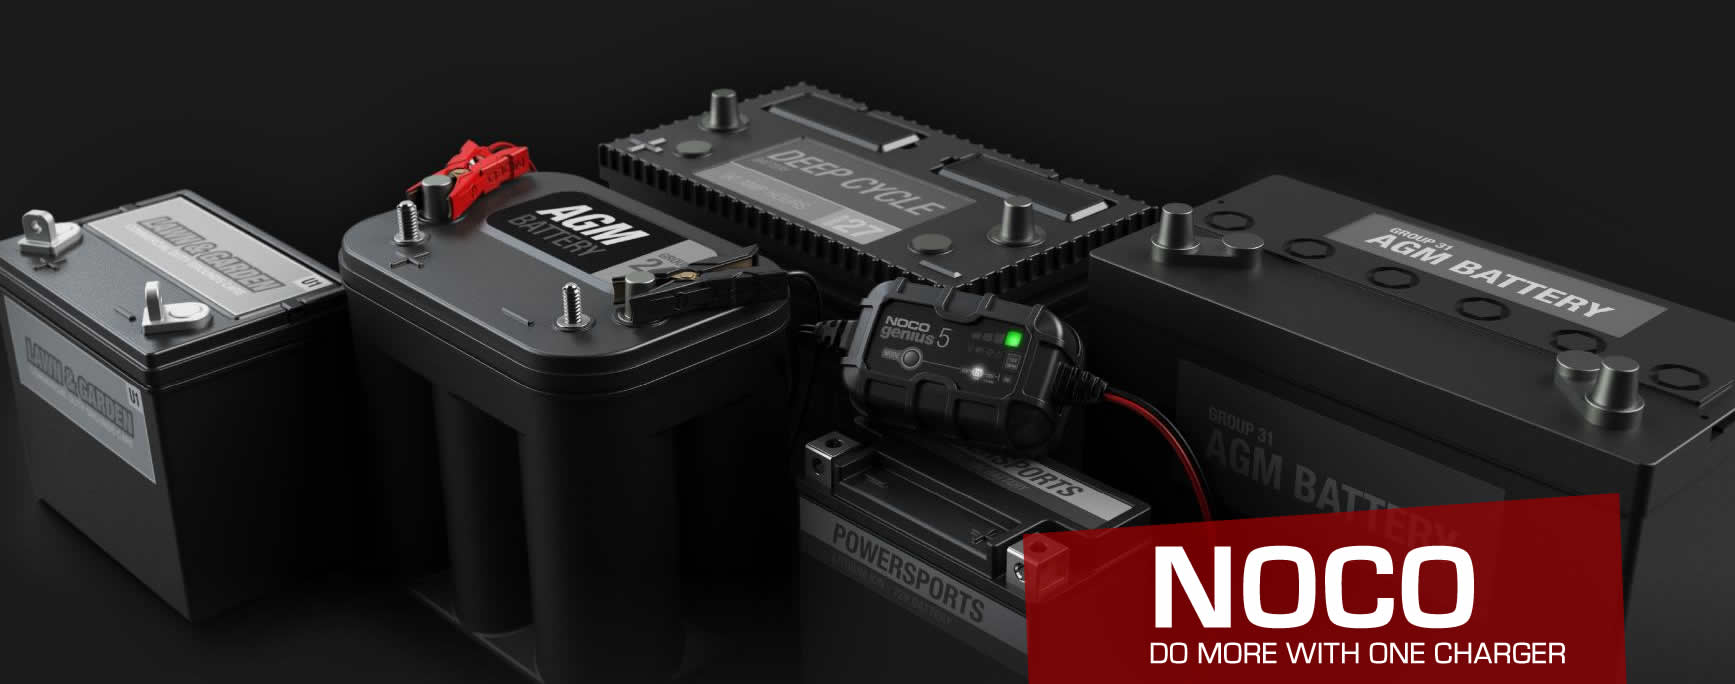 20 x Camelion A23 12V Batterie Knopfzelle MN21 L1028 23GA LRV08-4 x 5er